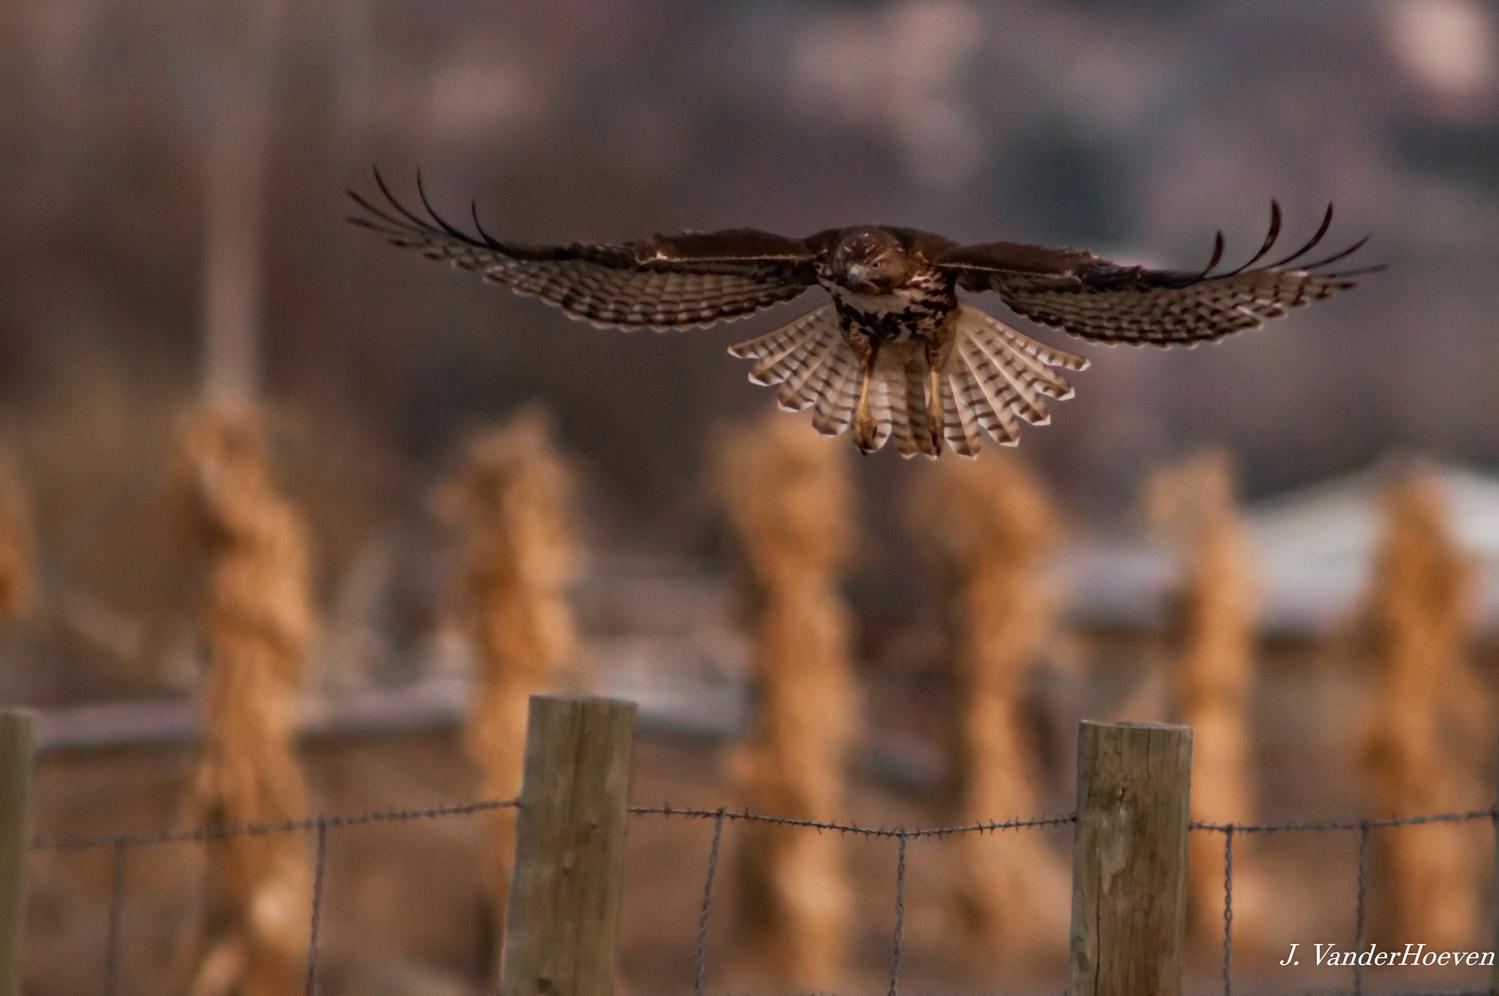 Fence Post Hopping by Jake VanderHoeven